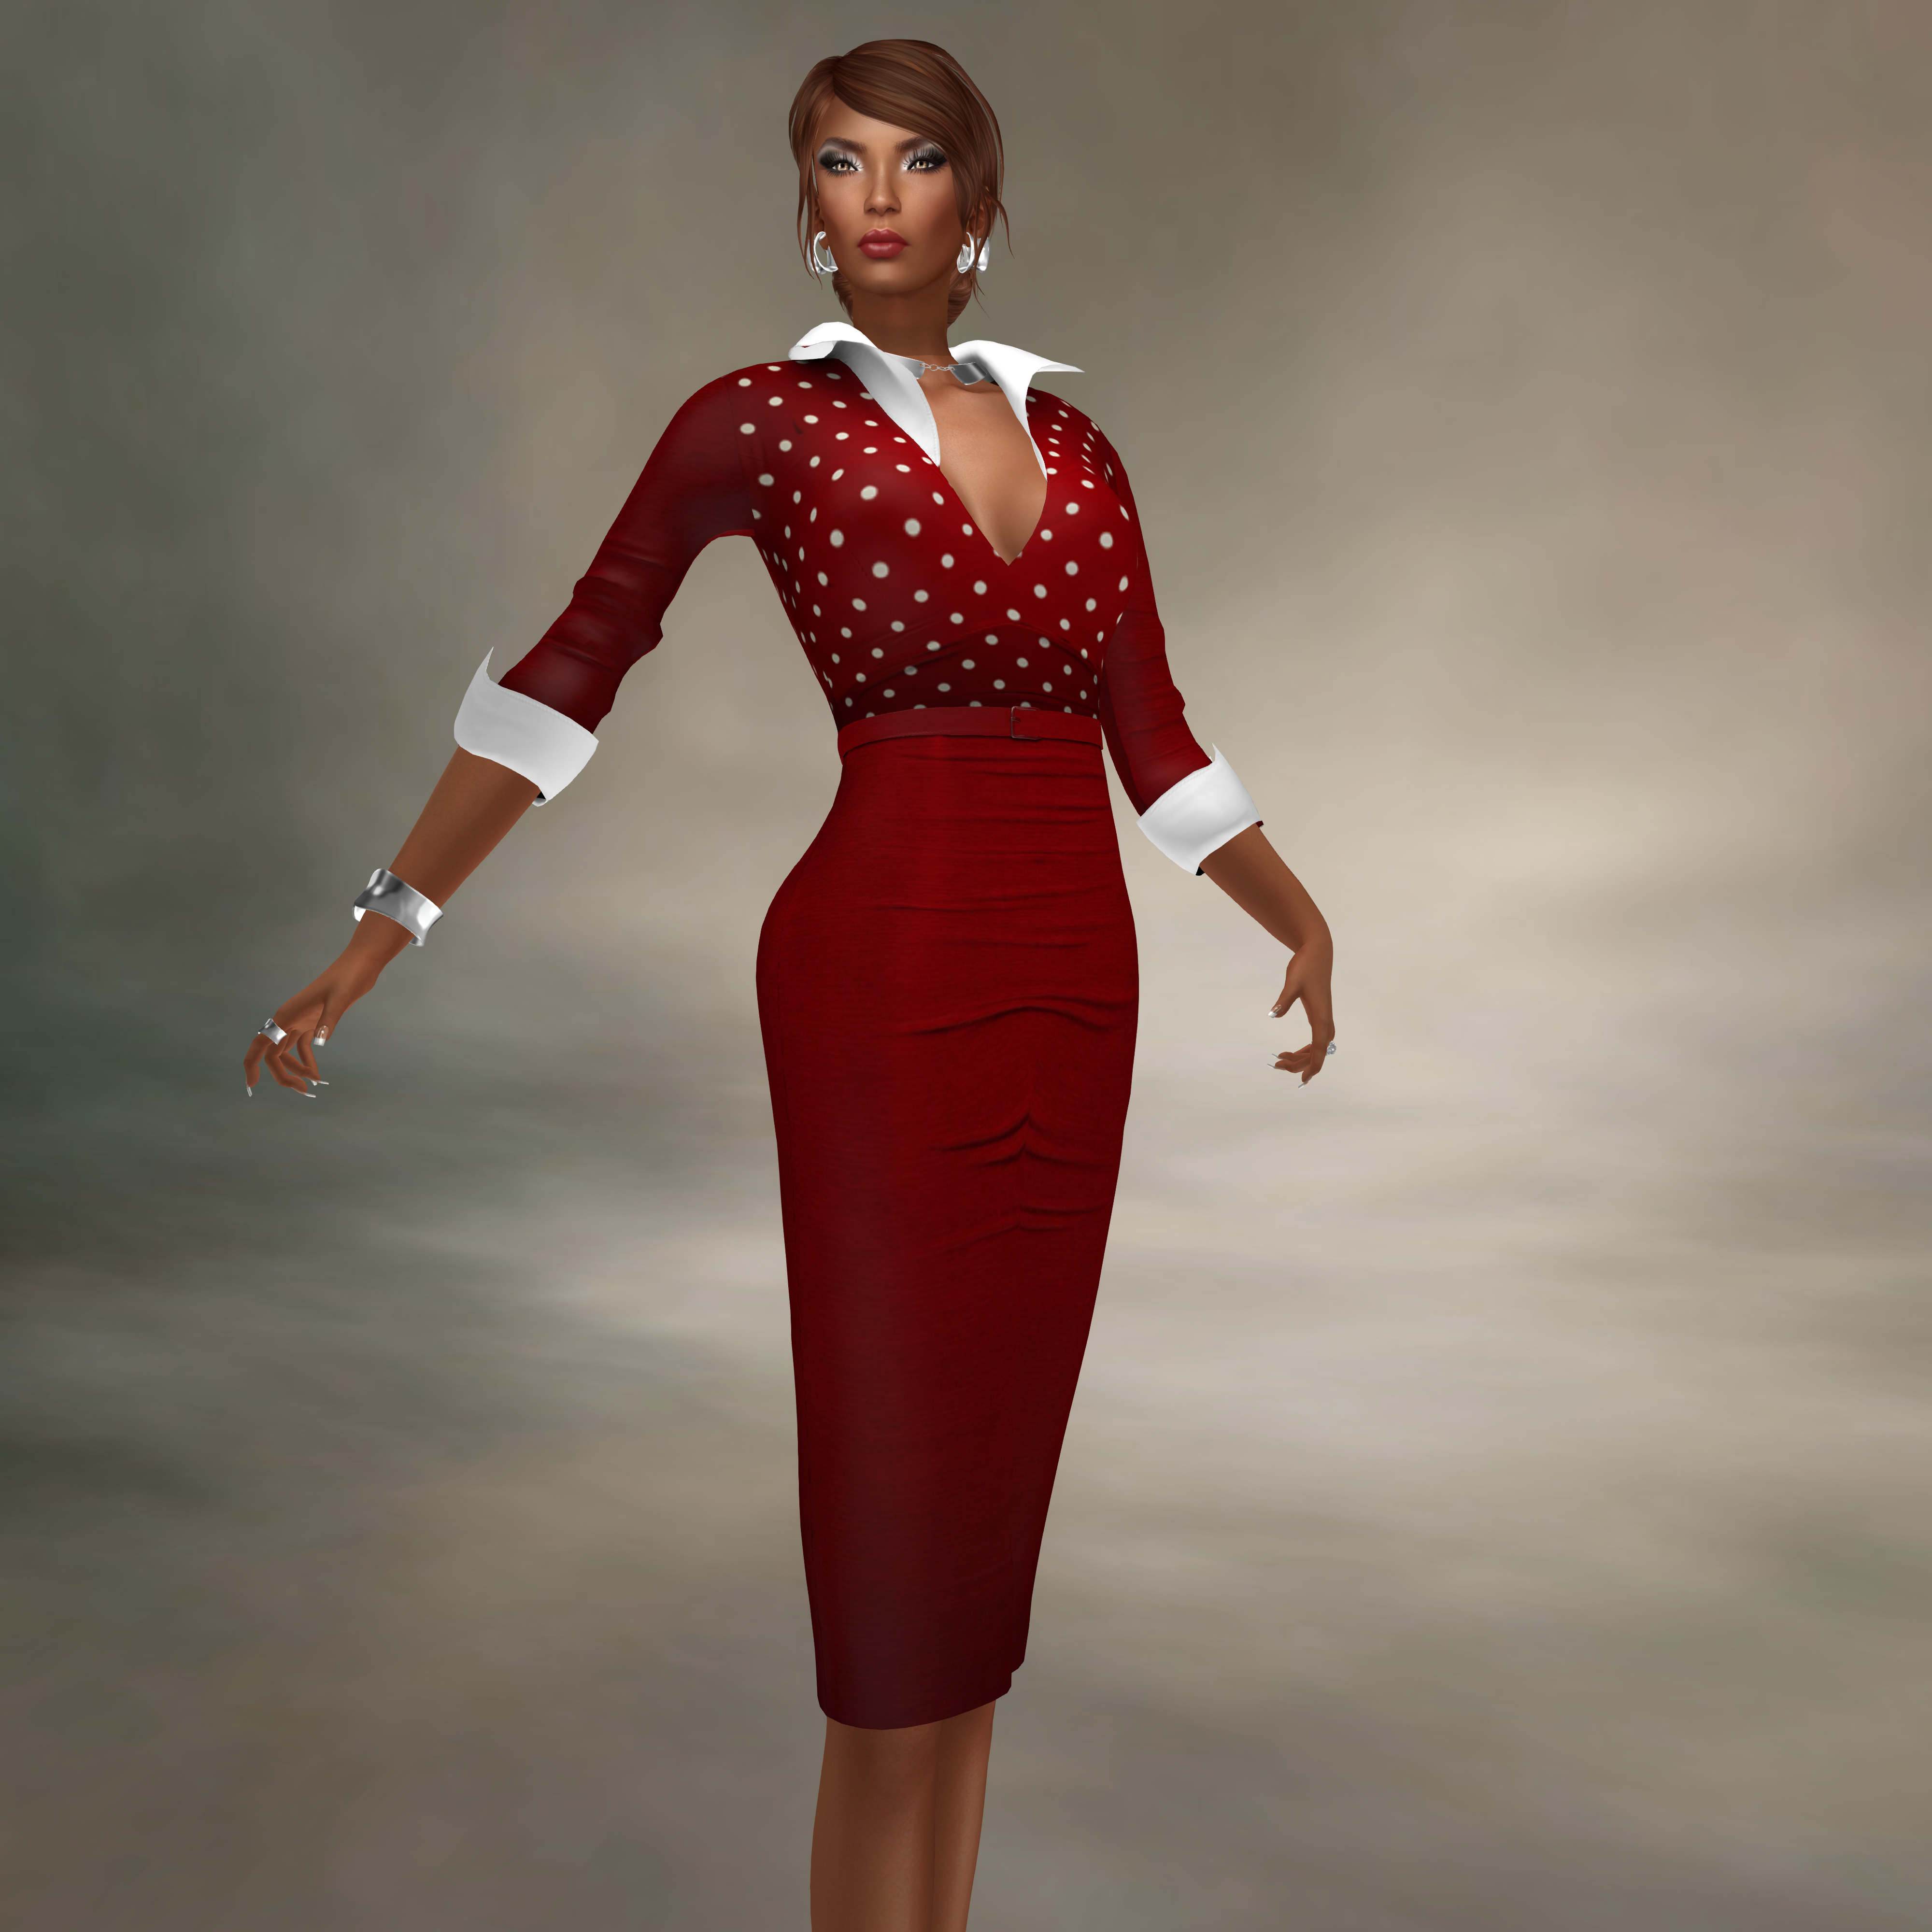 AnaMarkova@Designer Showcase- Katina (Scarlet polka)